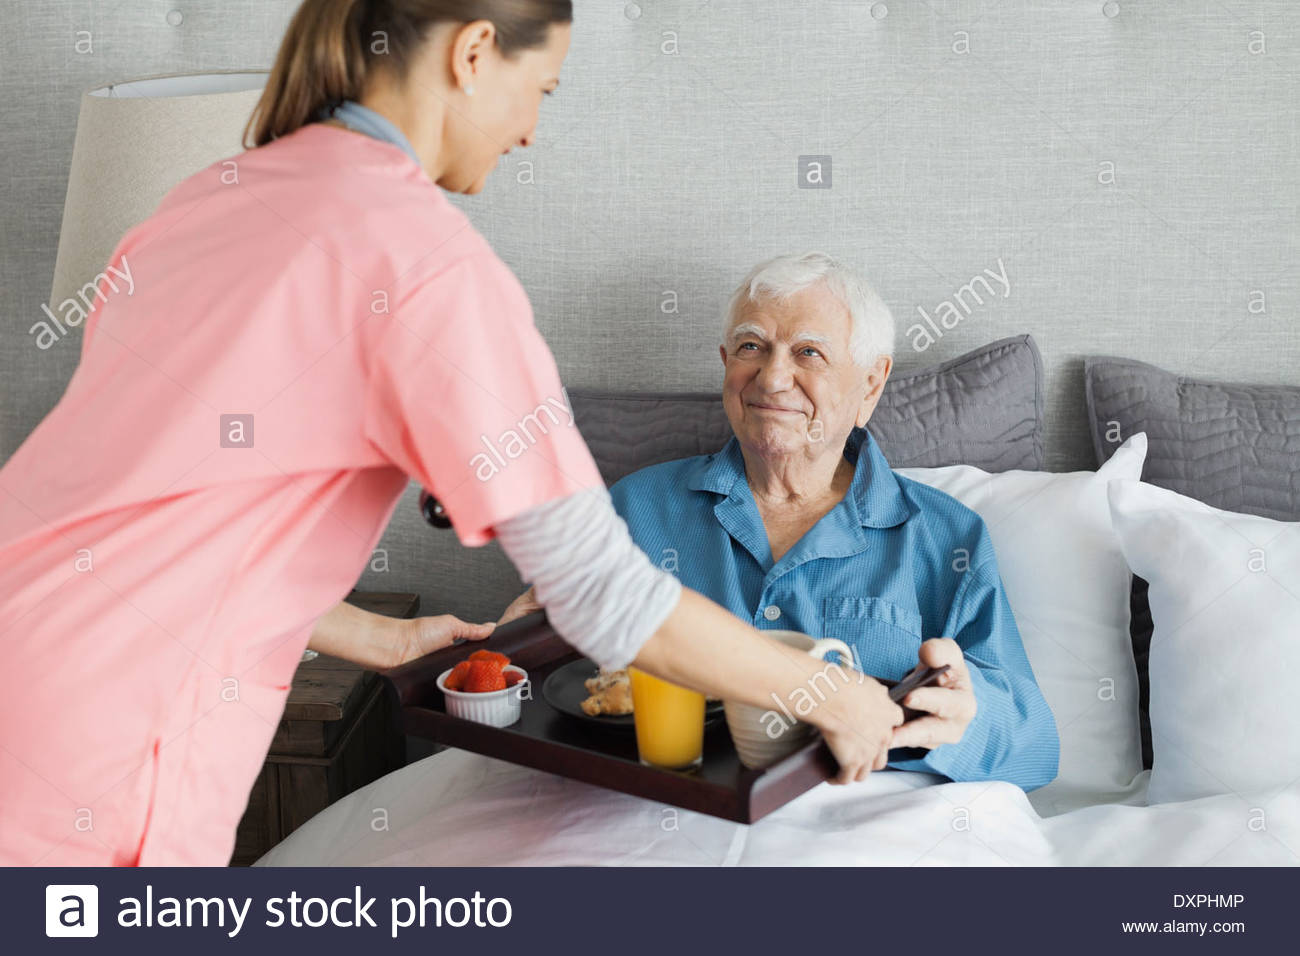 Home care nurse serving breakfast to senior man - Stock Image